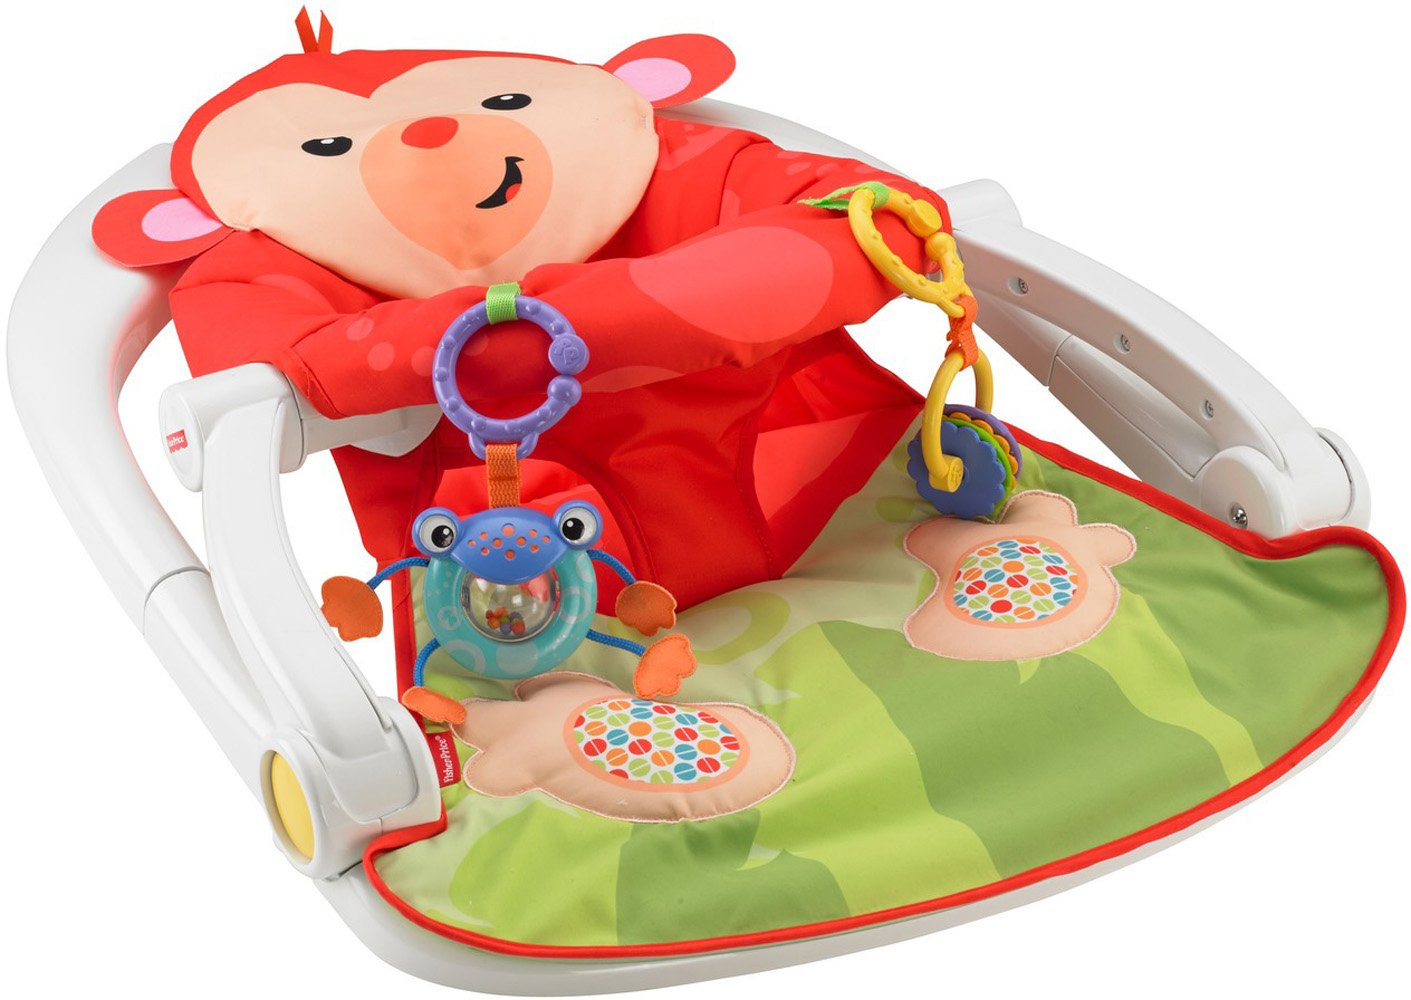 Fantastic Dreambaby Premium Baby Bath Seat Pink Frieze - Luxurious ...